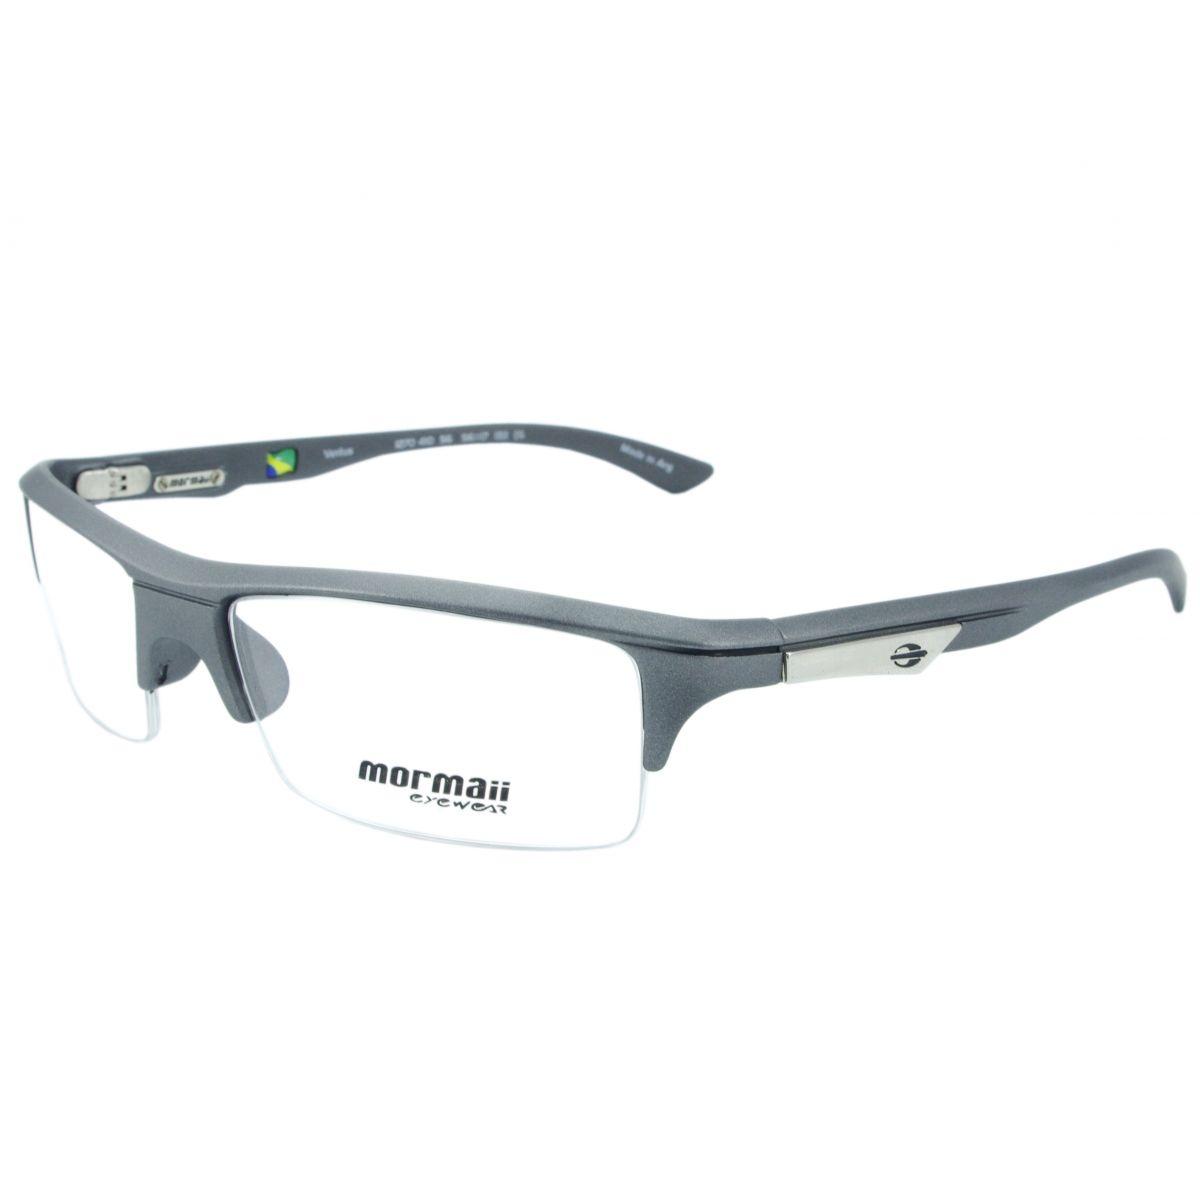 d6750206ff932 Oculos Mormaii Masculino Lançamento – Southern California Weather Force